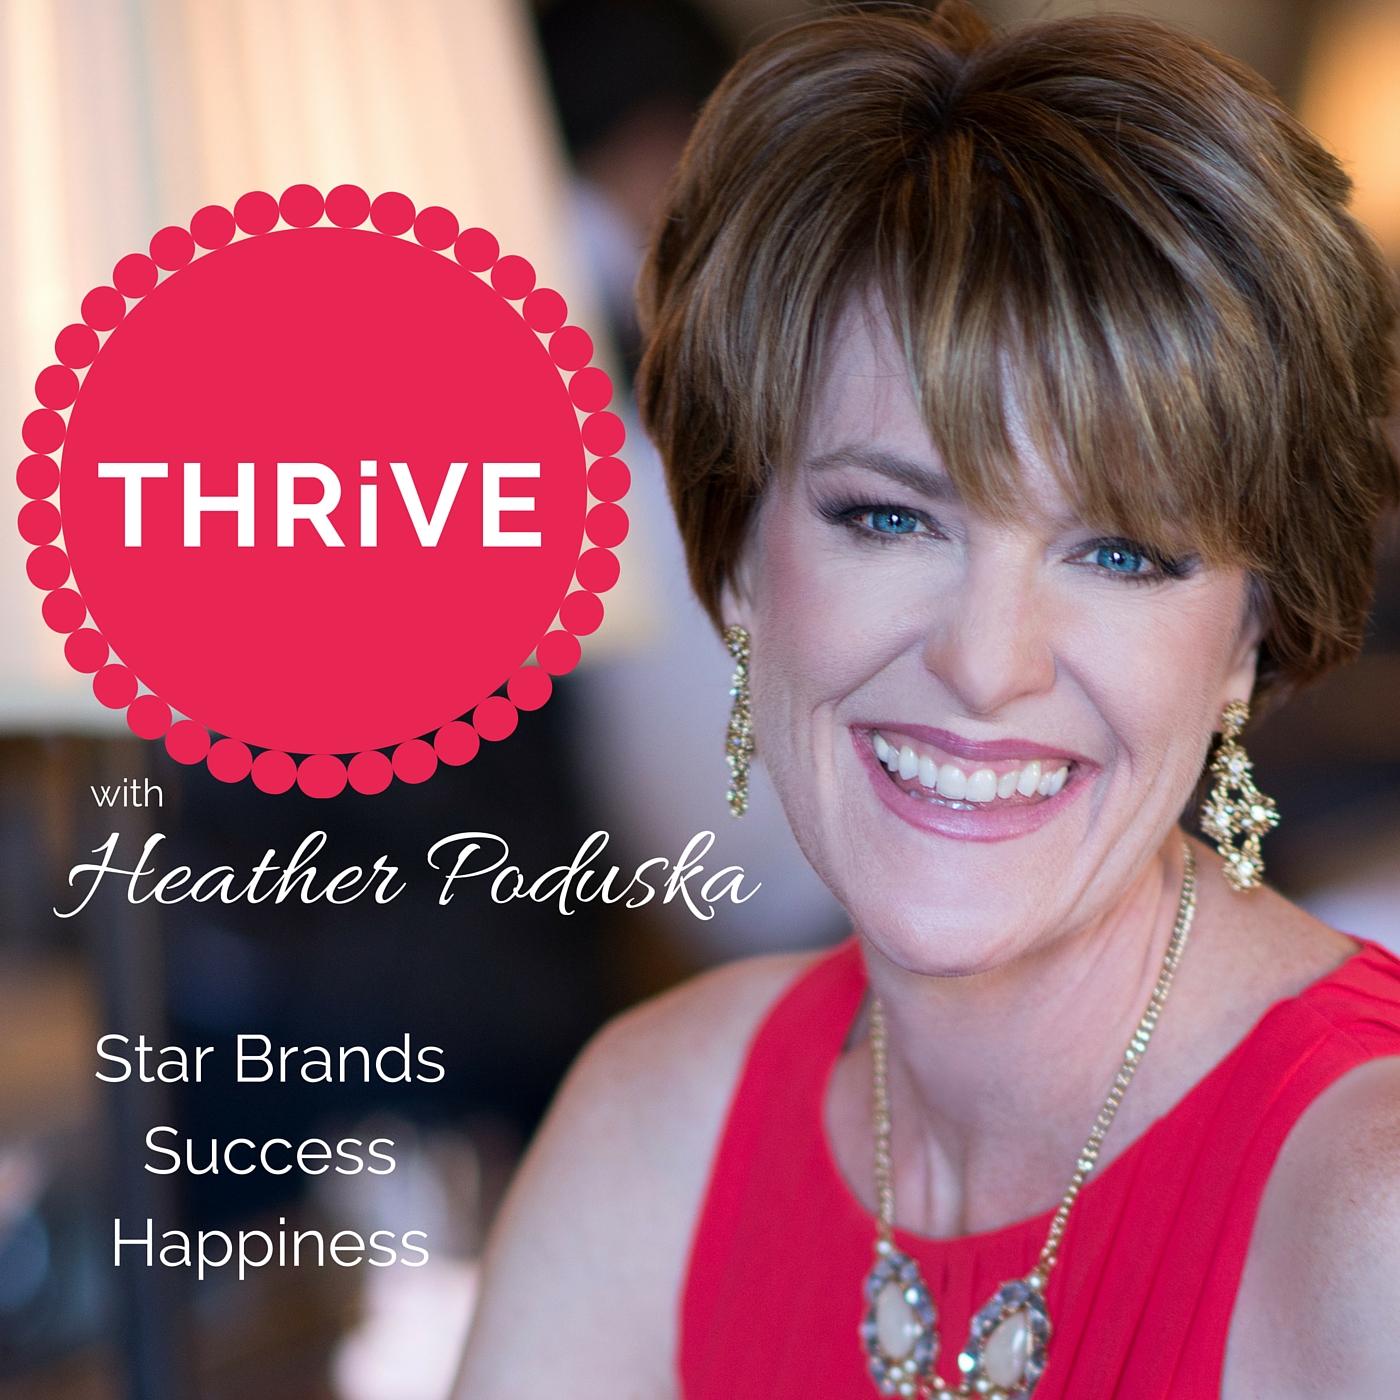 "<![CDATA[""Thrive"" with Heather Poduska]]>"